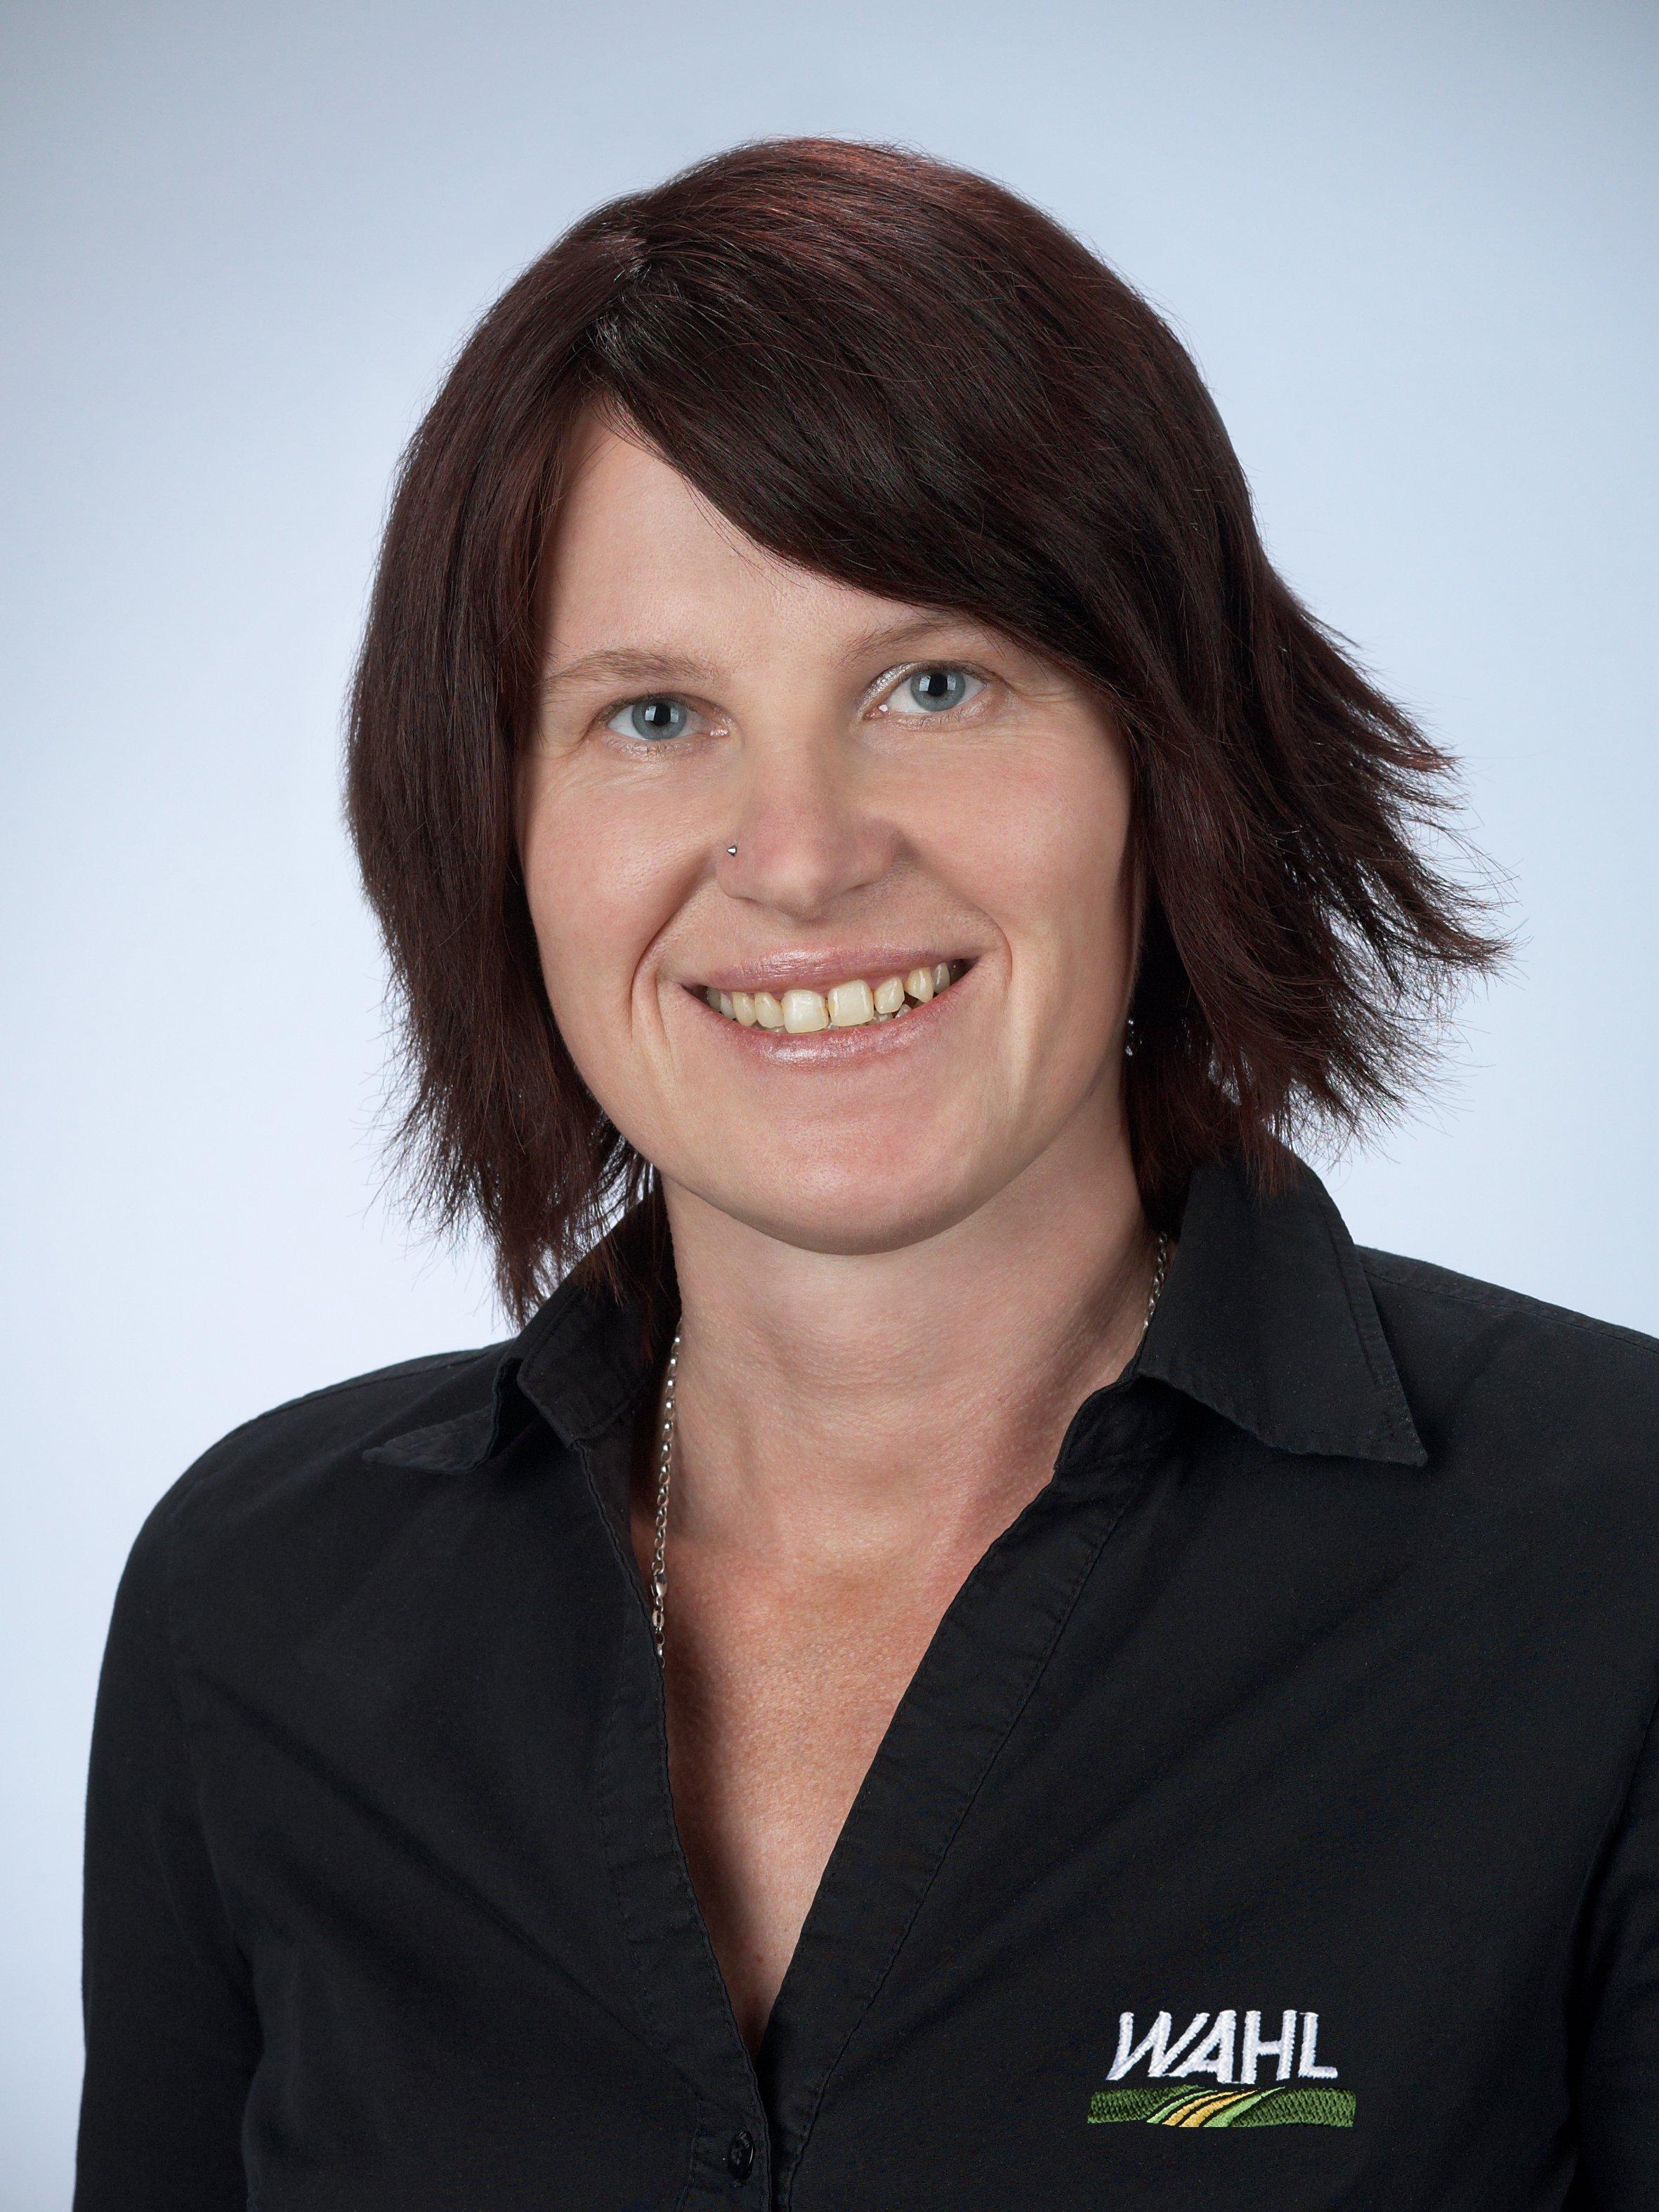 Gertrud Meggle